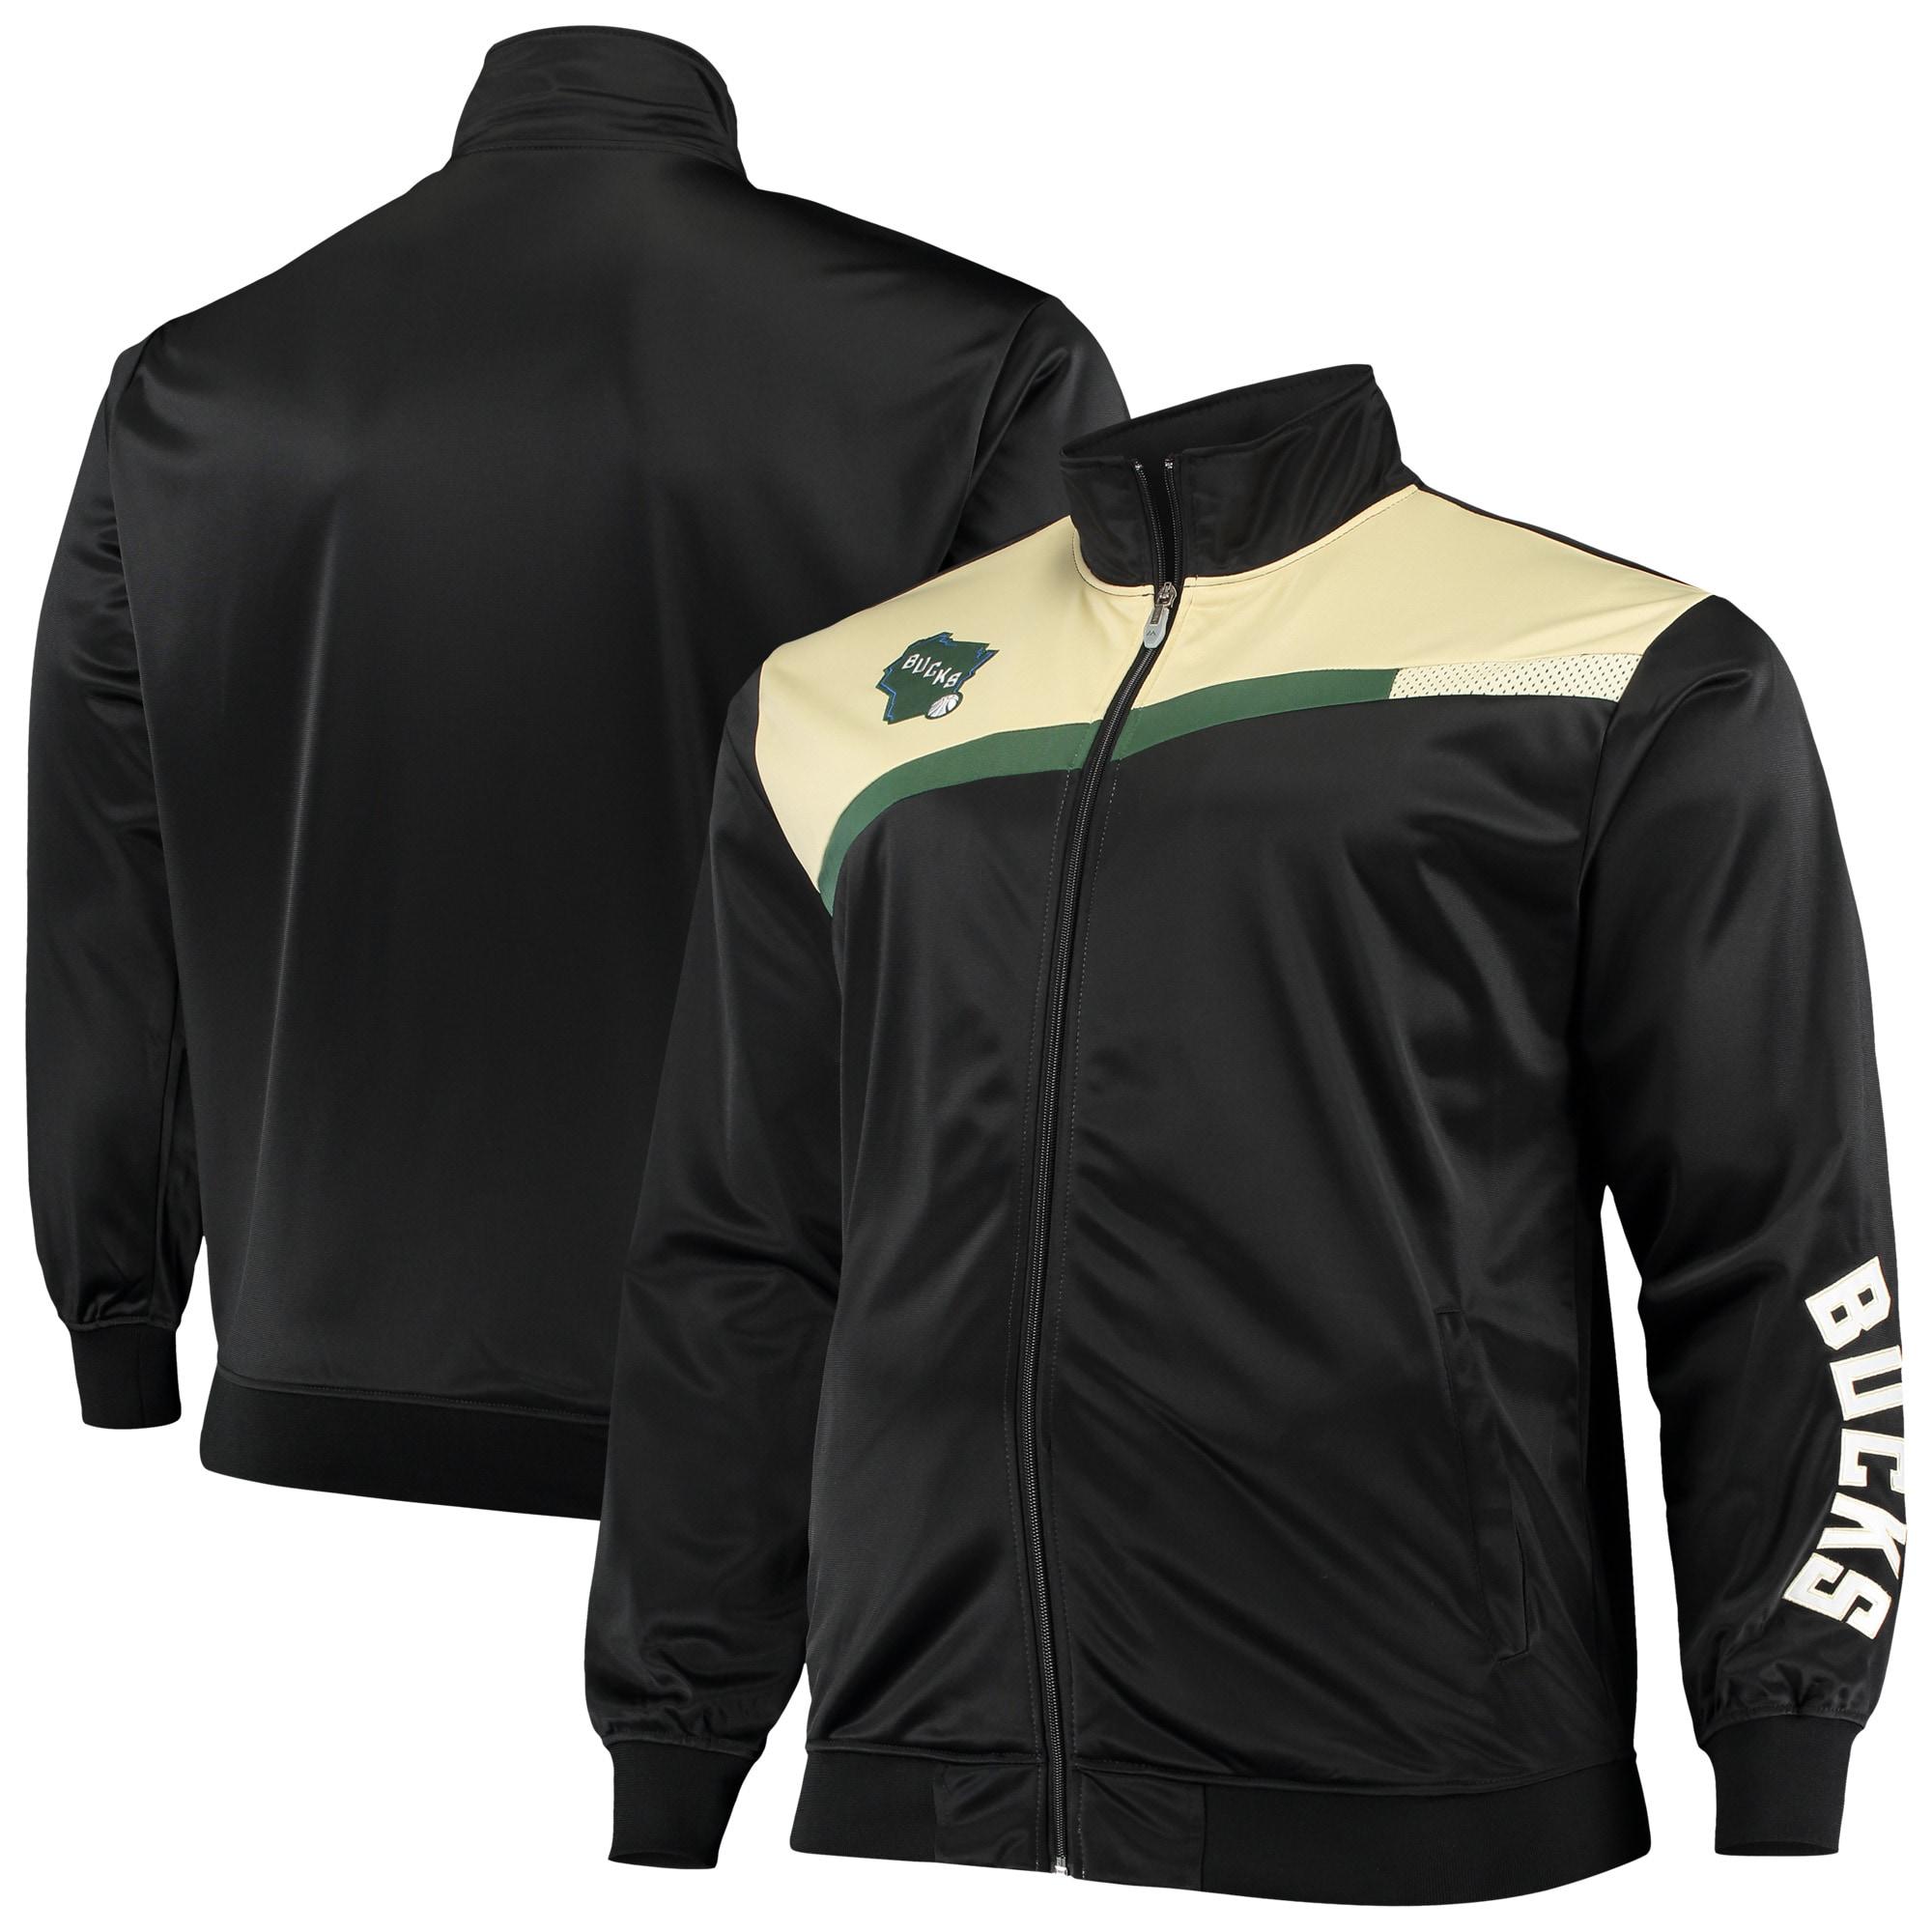 Milwaukee Bucks Big & Tall Showtime Tricot Full-Zip Track Jacket - Black/Cream